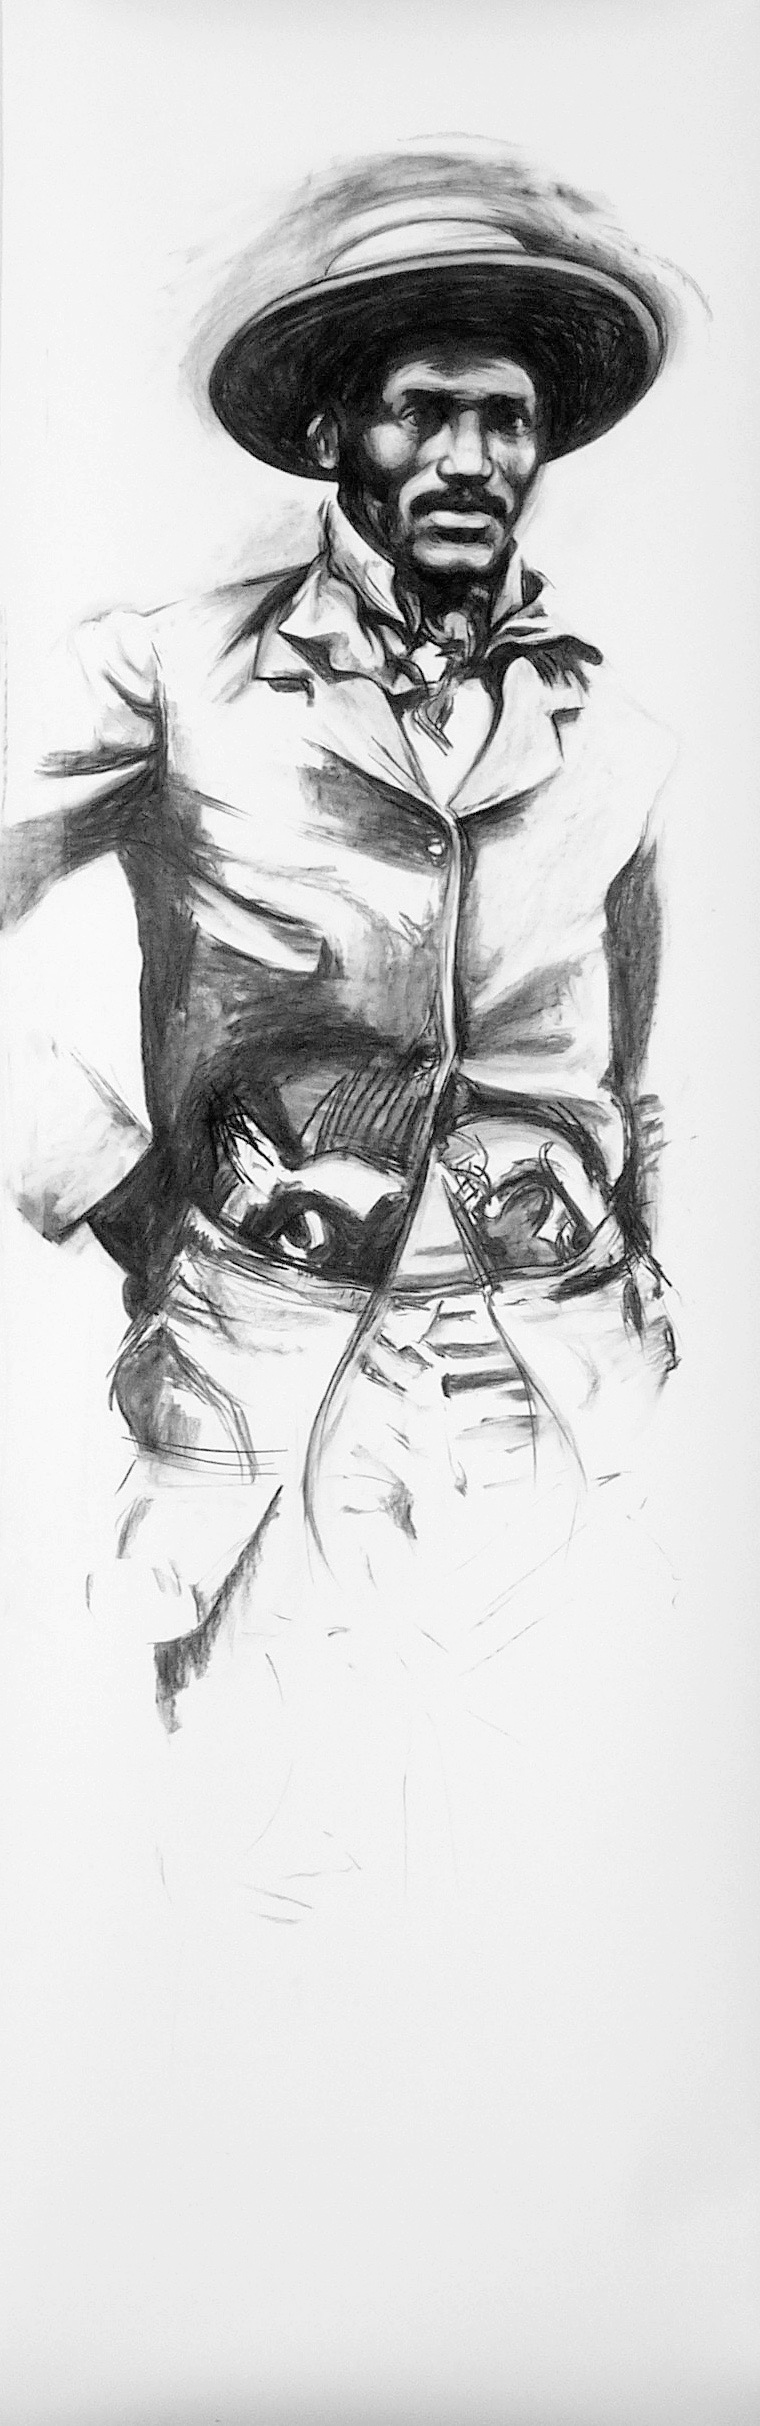 30 Isom Dart, 2005, Vine charcoal on paper,_89 x 29 in._.jpg